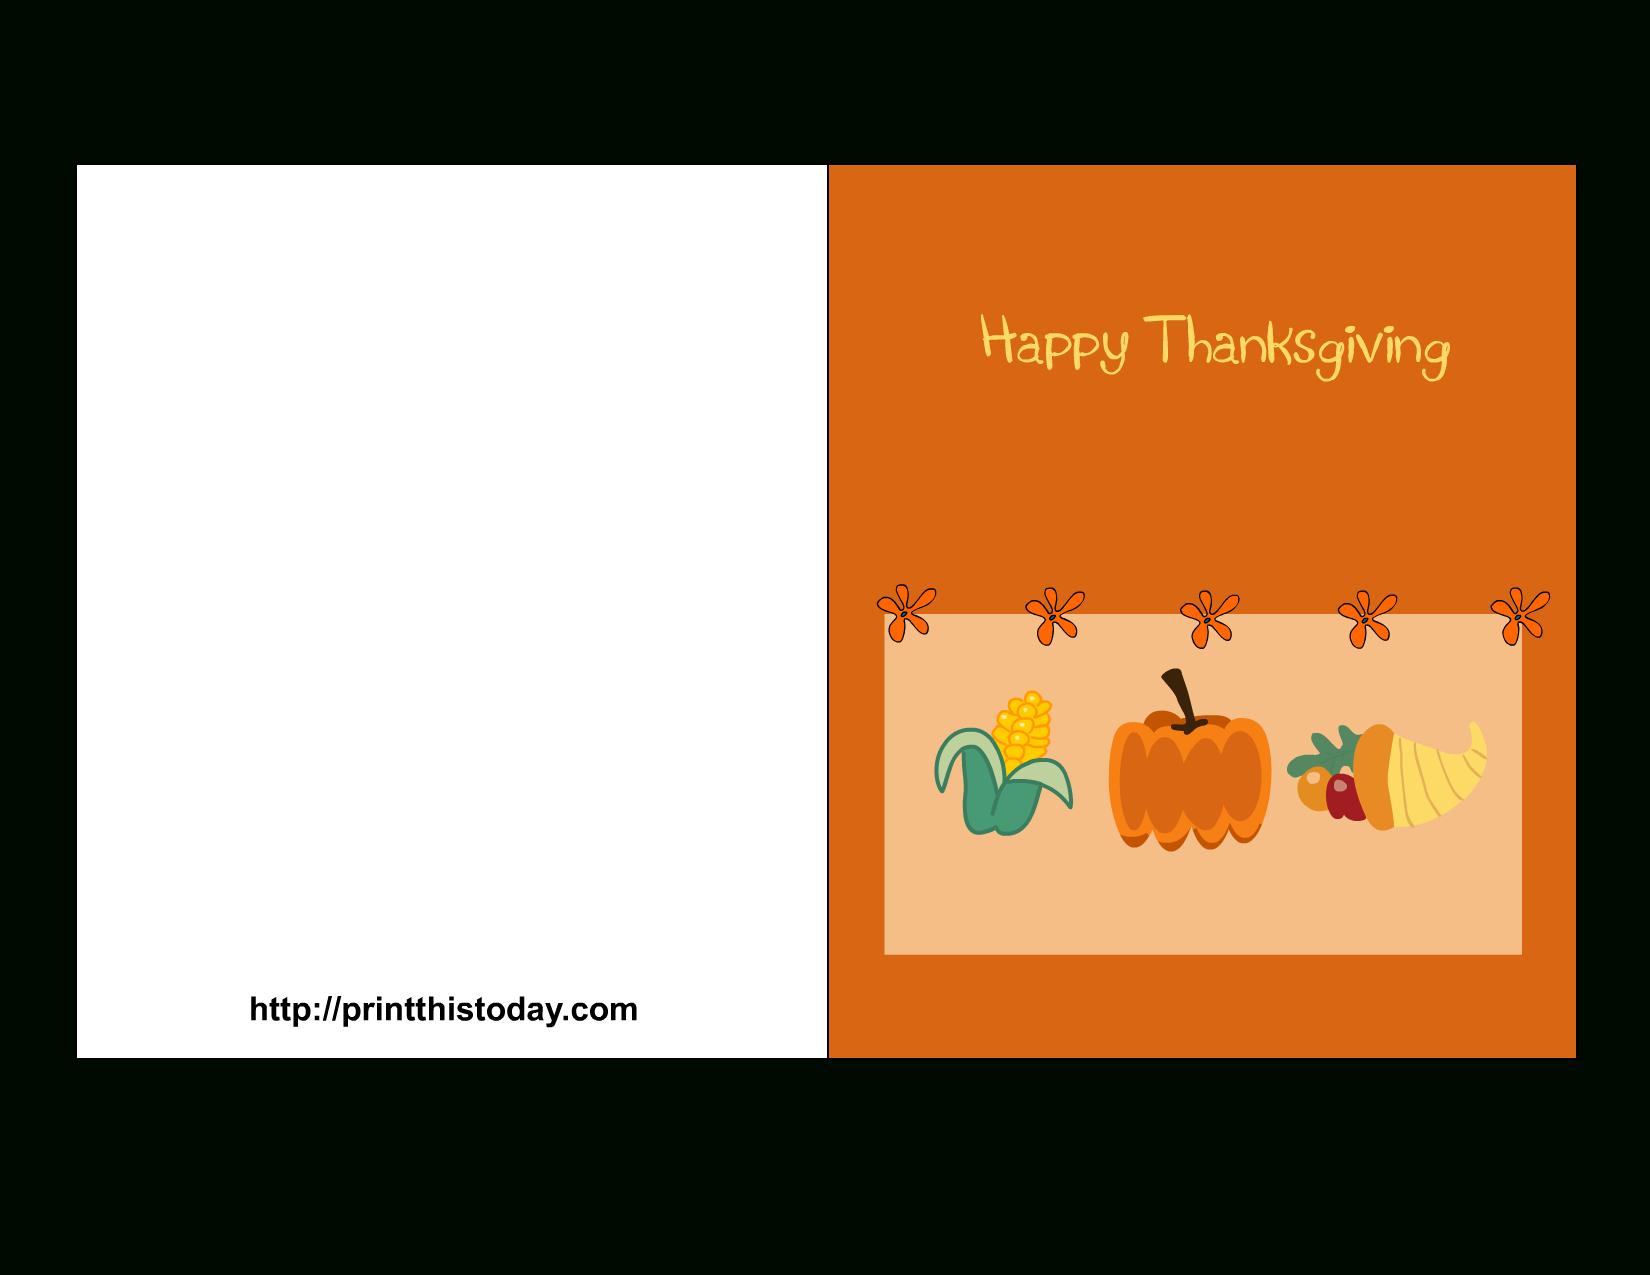 Free Printable Thanksgiving Cards - Free Printable Thanksgiving Cards